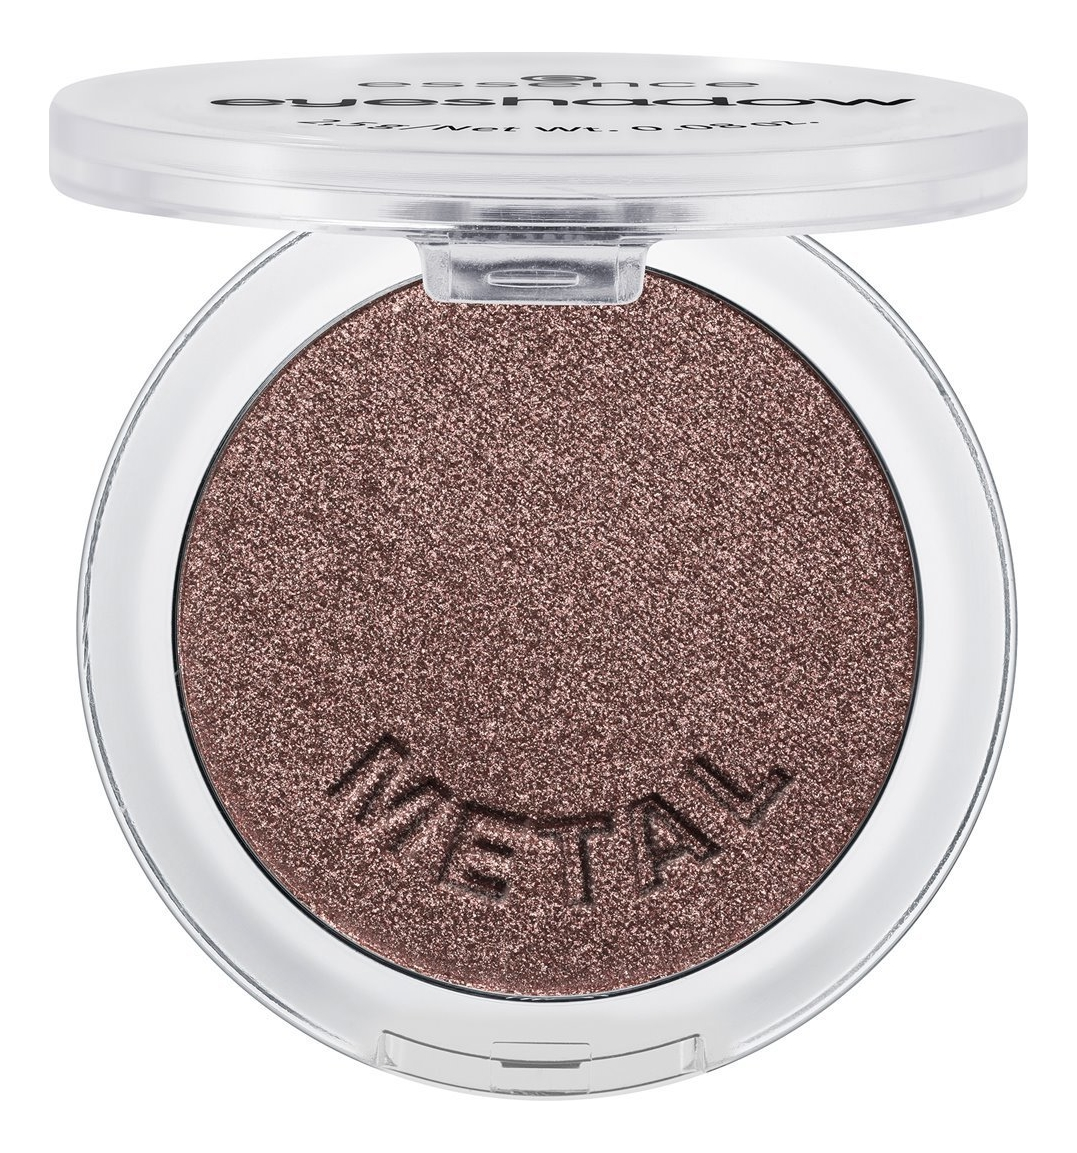 Купить Тени для век Eyeshadow 2, 5г: 17 Fairytale, essence